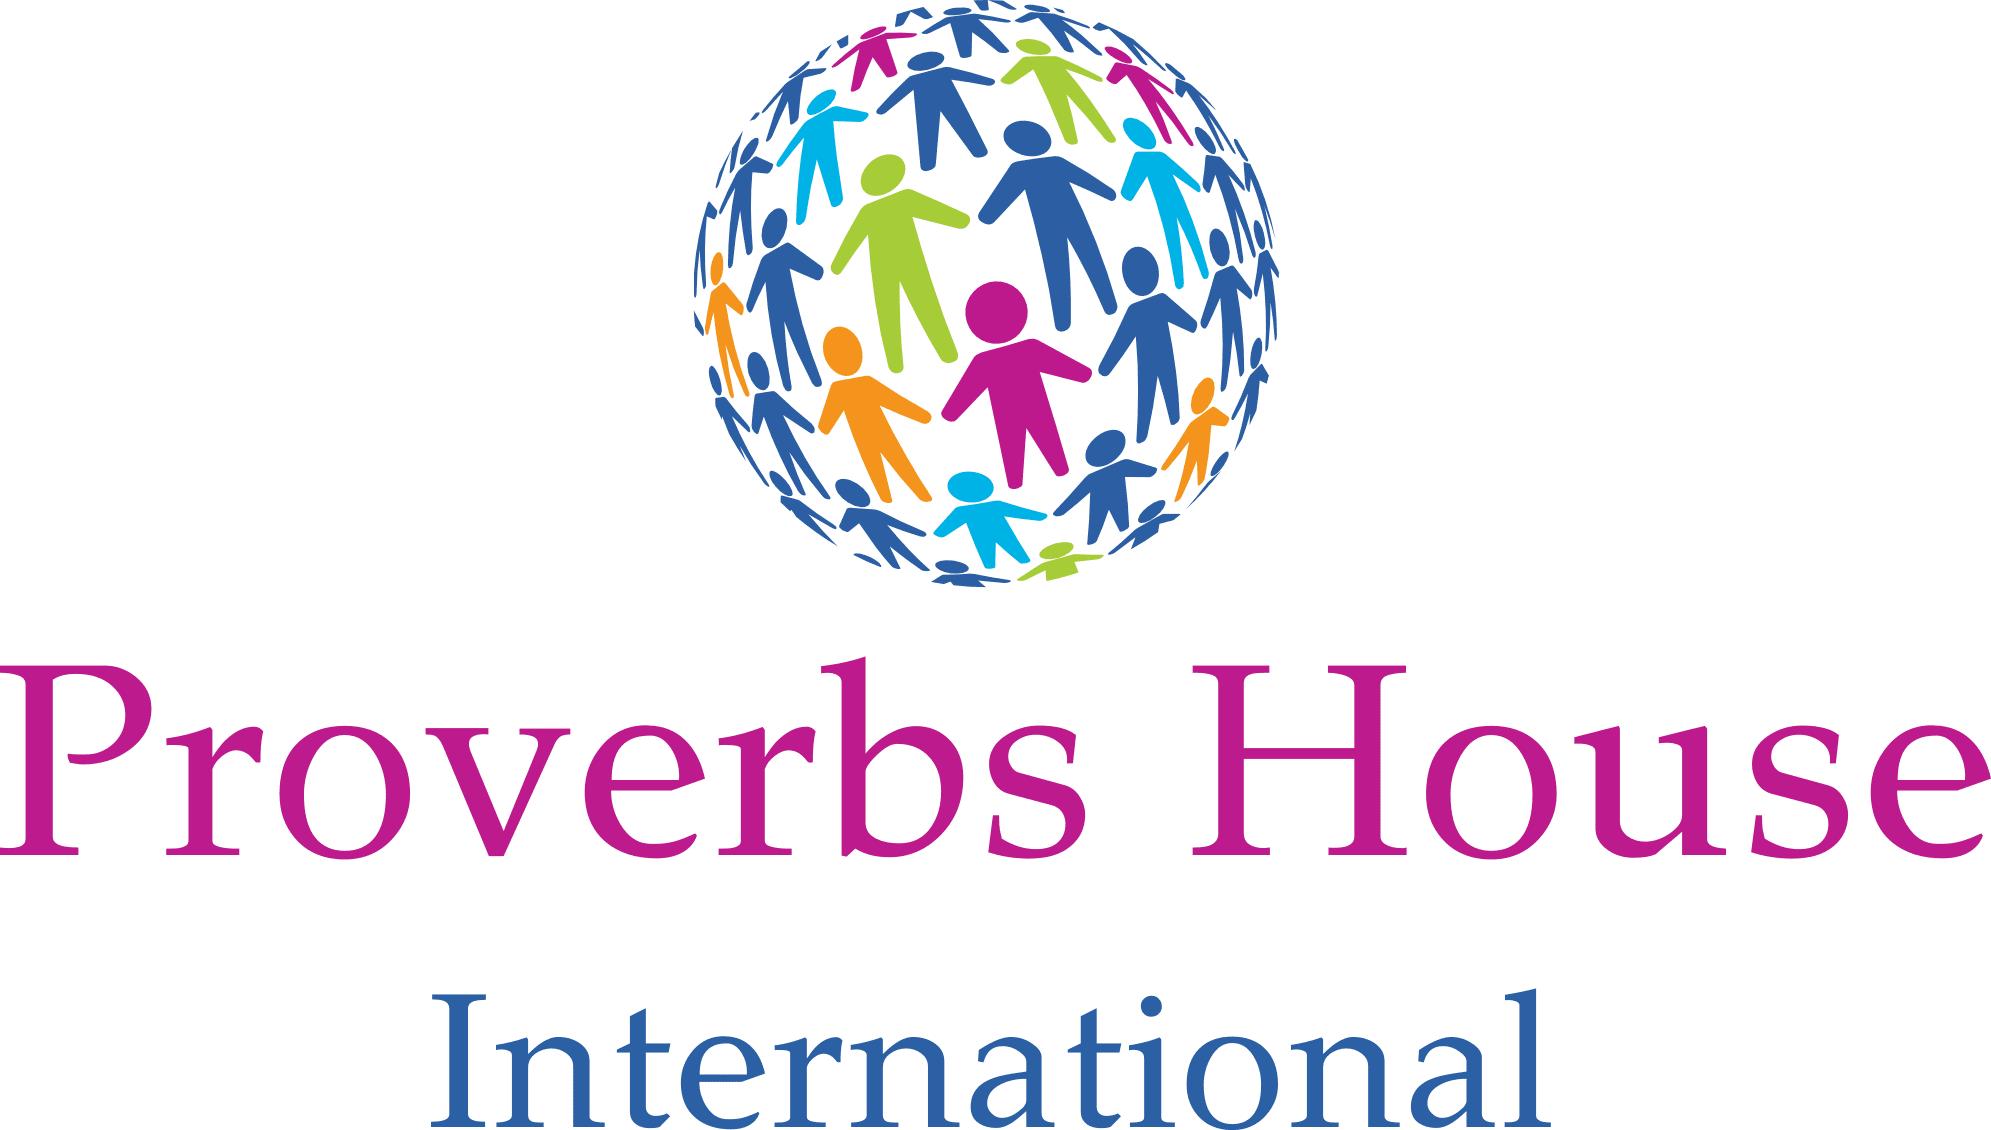 Proverbs House International